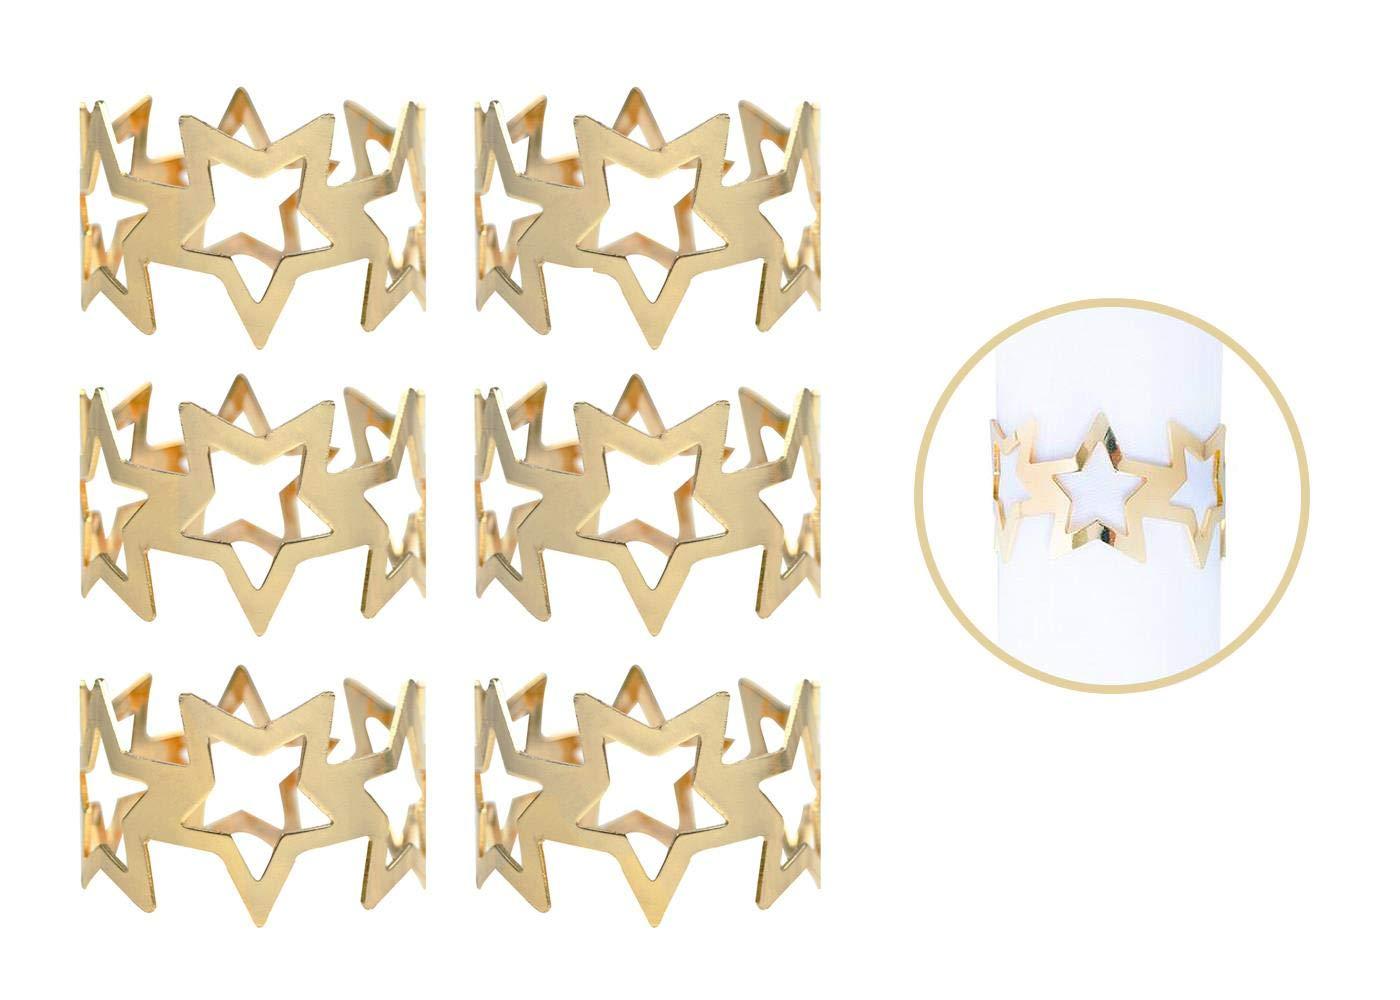 Y/öL 6 Napkin Rings Gold Star Metal Christmas Xmas Party Table Set Festive Round Napkin Holders Tableware